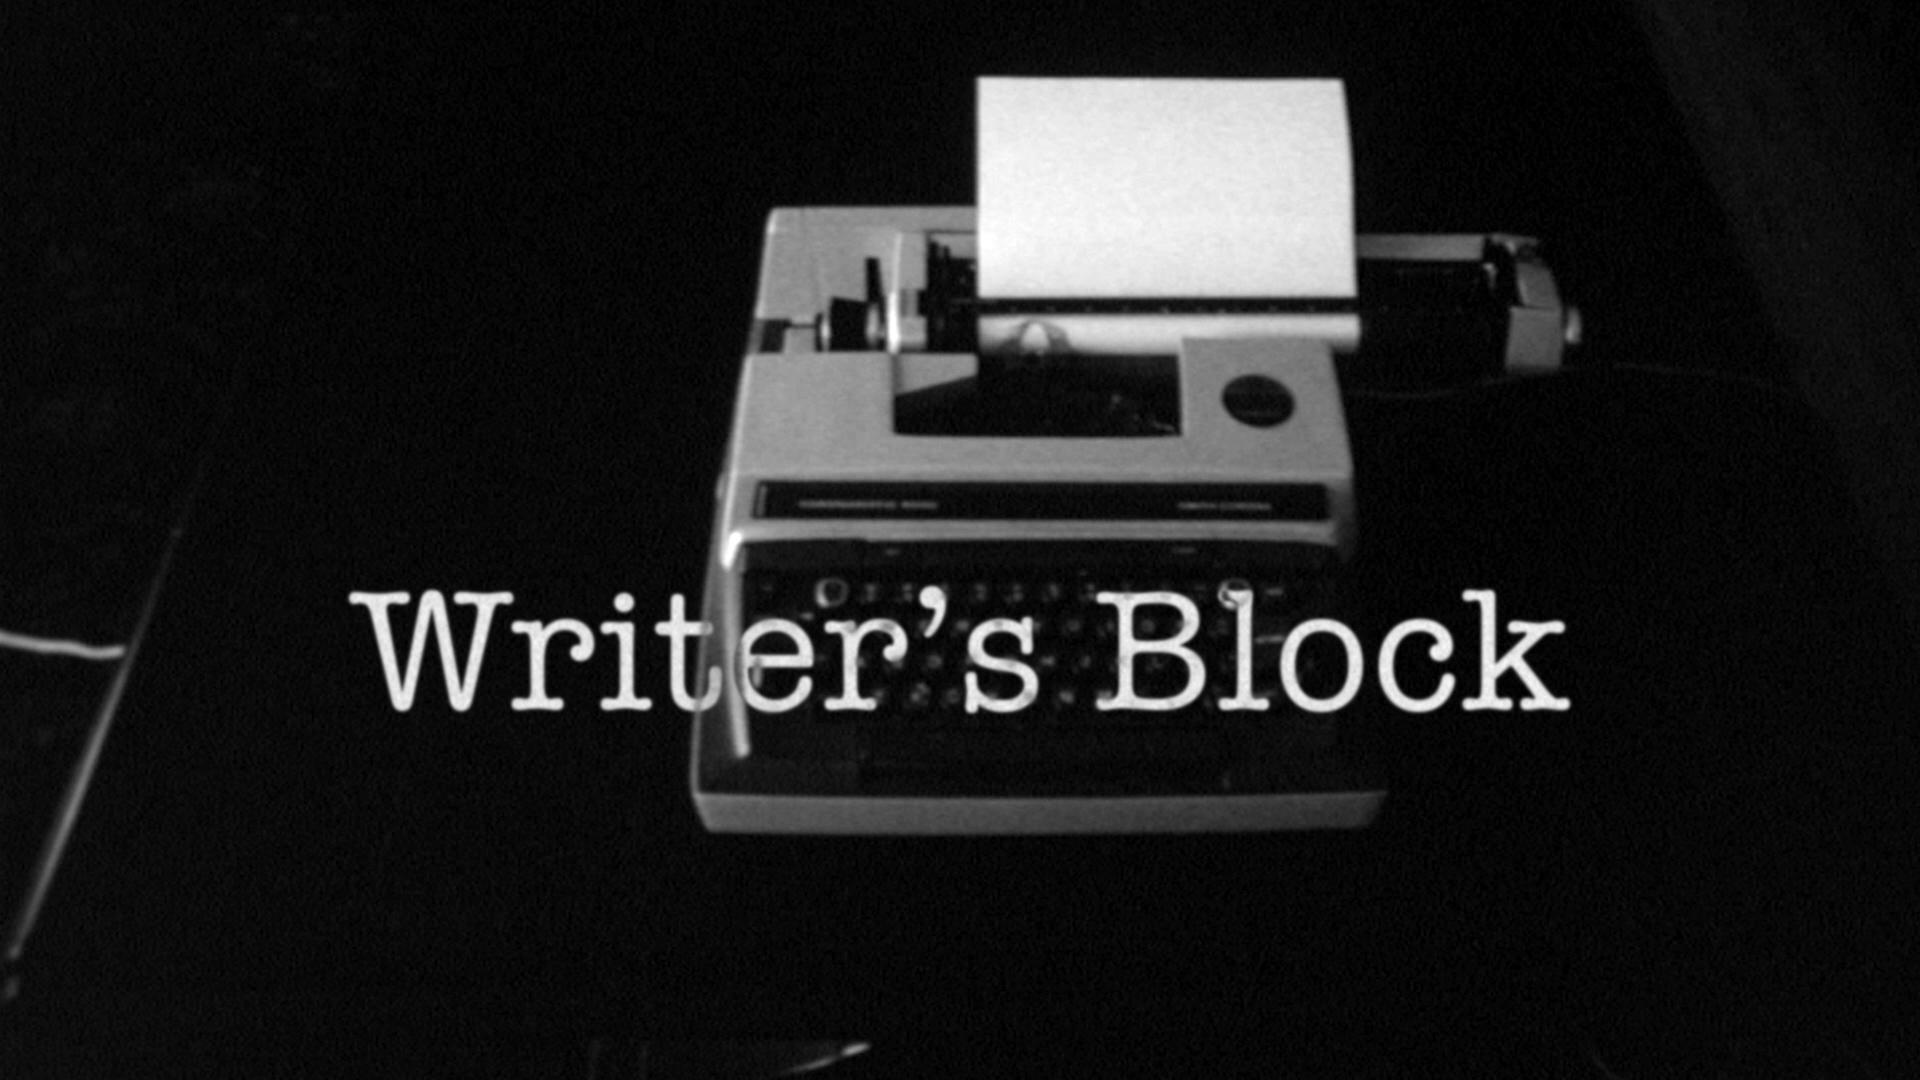 writers-block-title.jpg